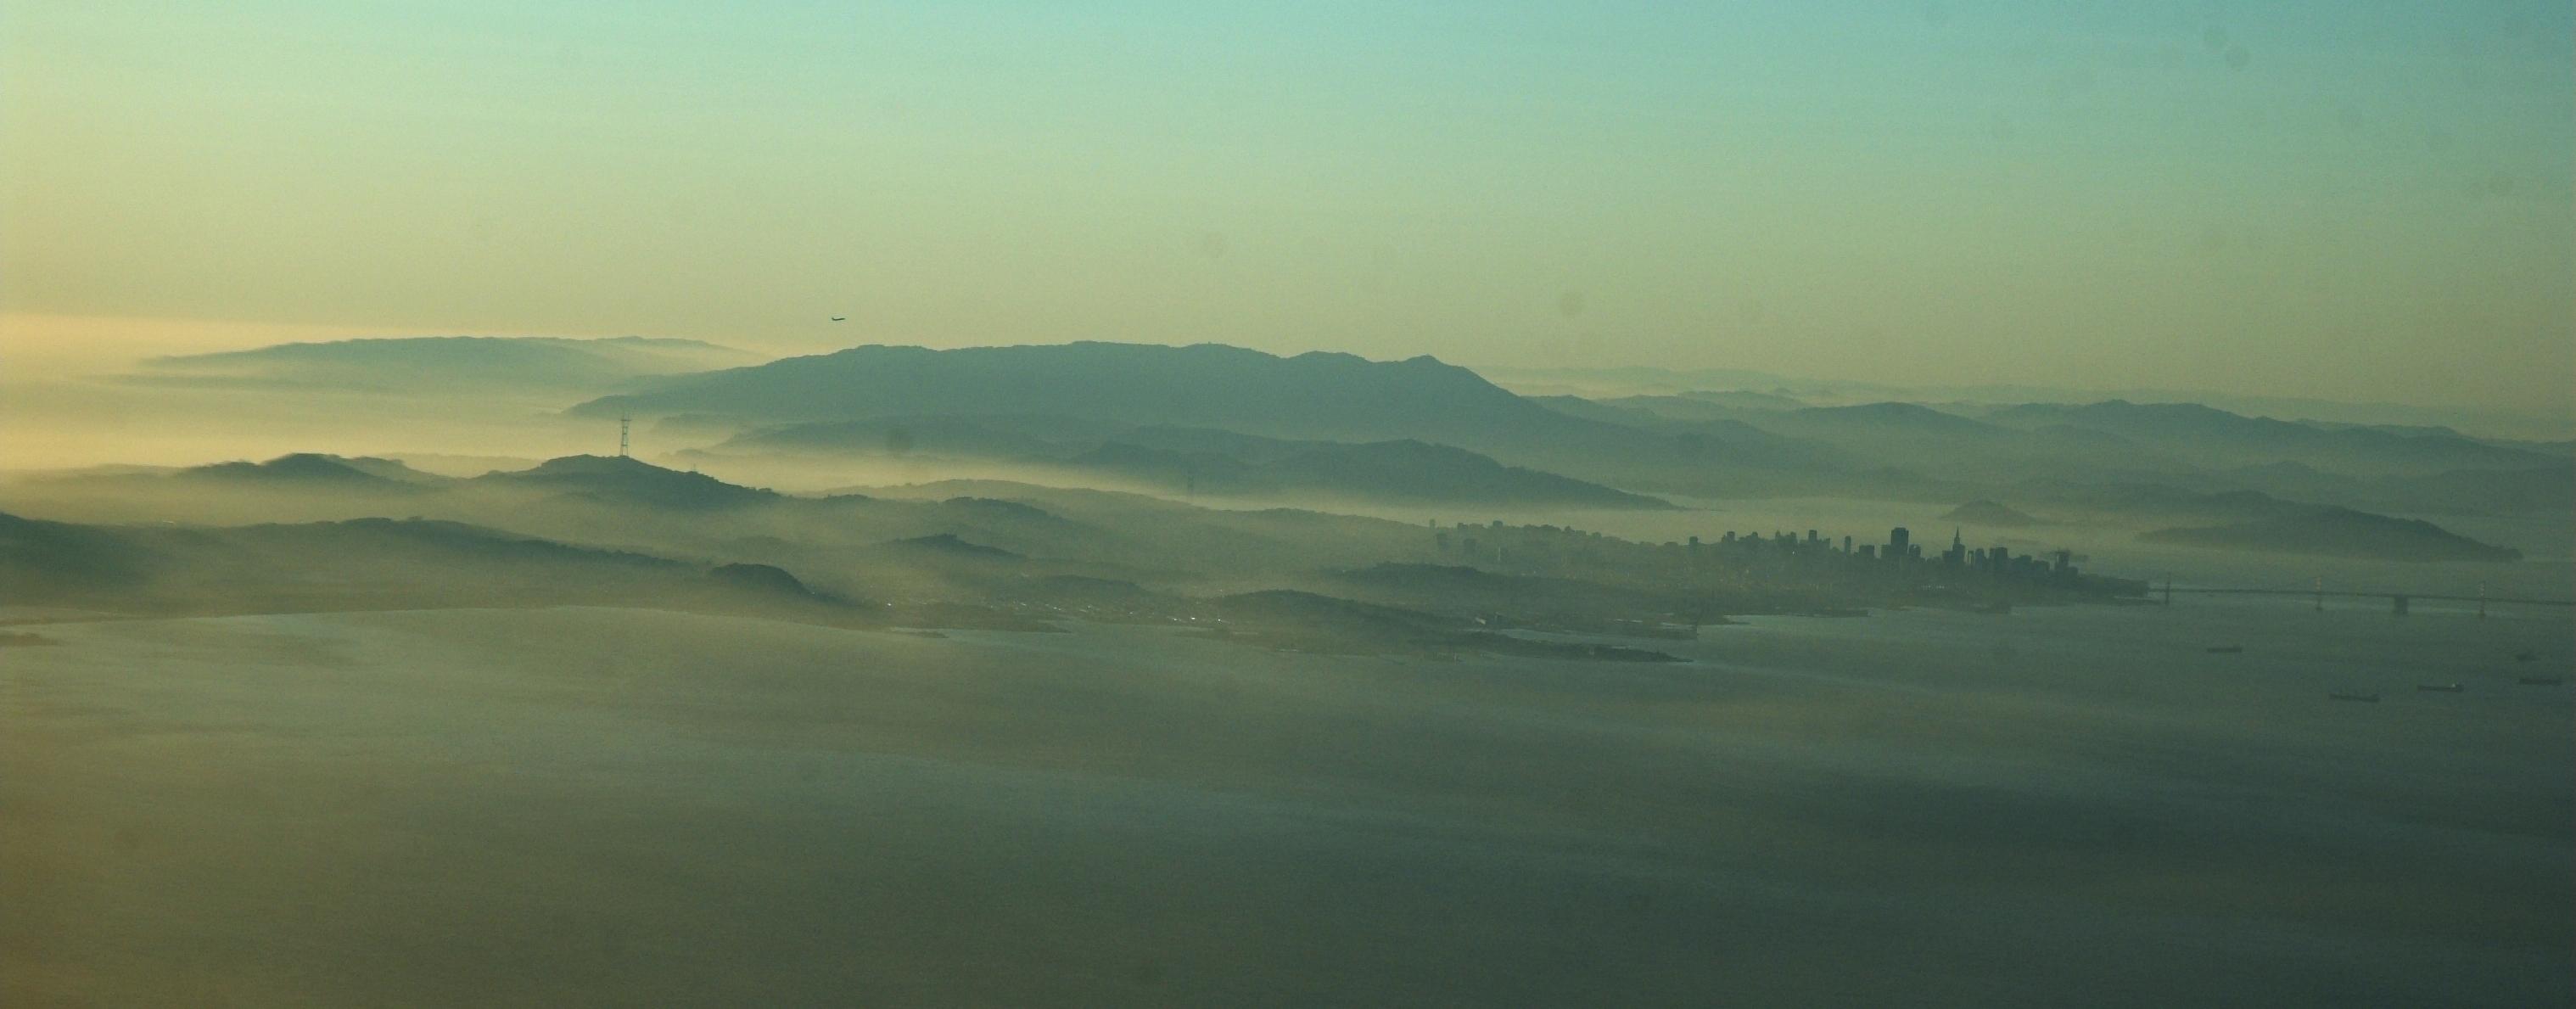 Photo of fog-covered San Francisco.